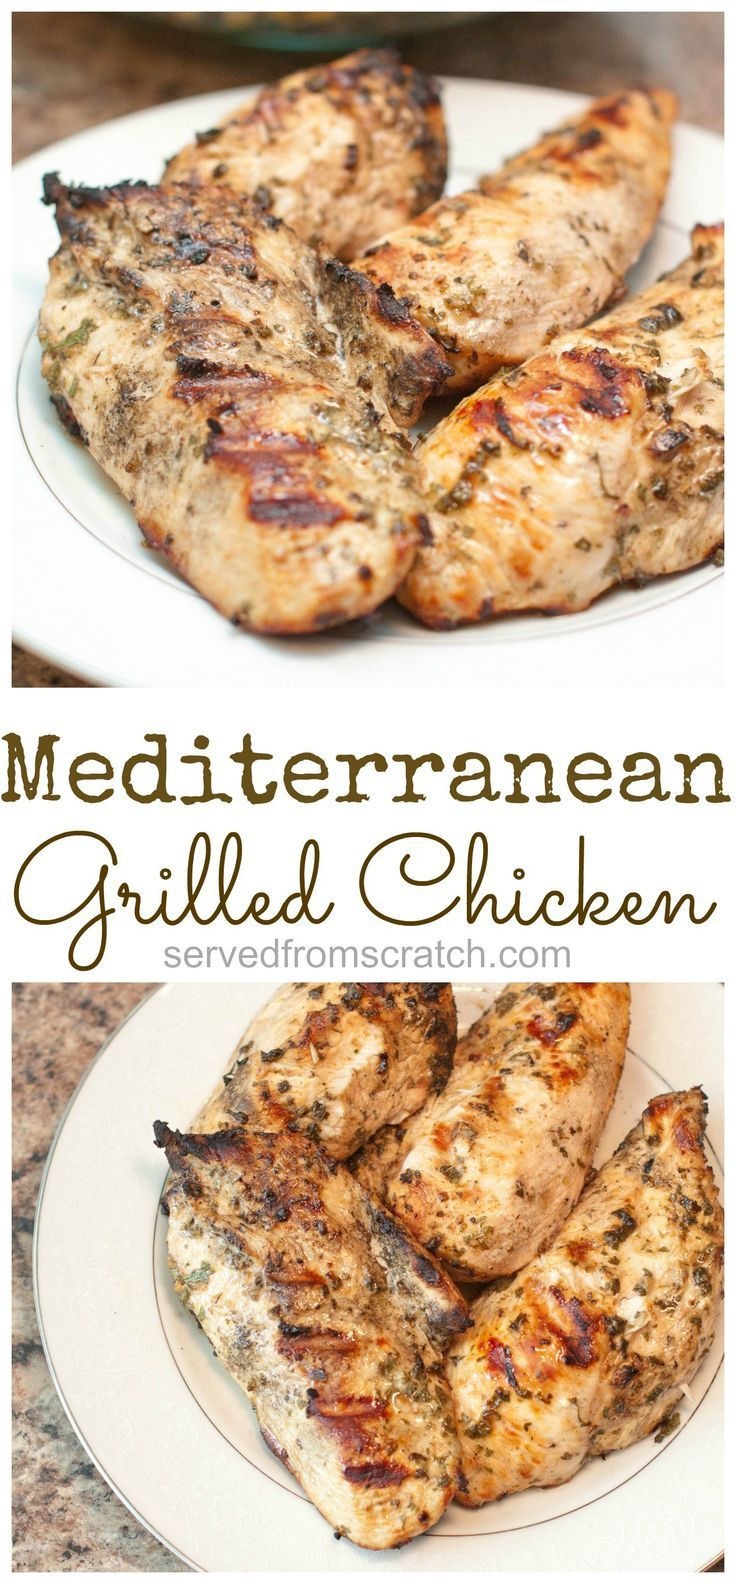 Creamy Burito Casserole Foodqik Best Grilled Chicken Recipe Grilled Chicken Recipes Chicken Recipes